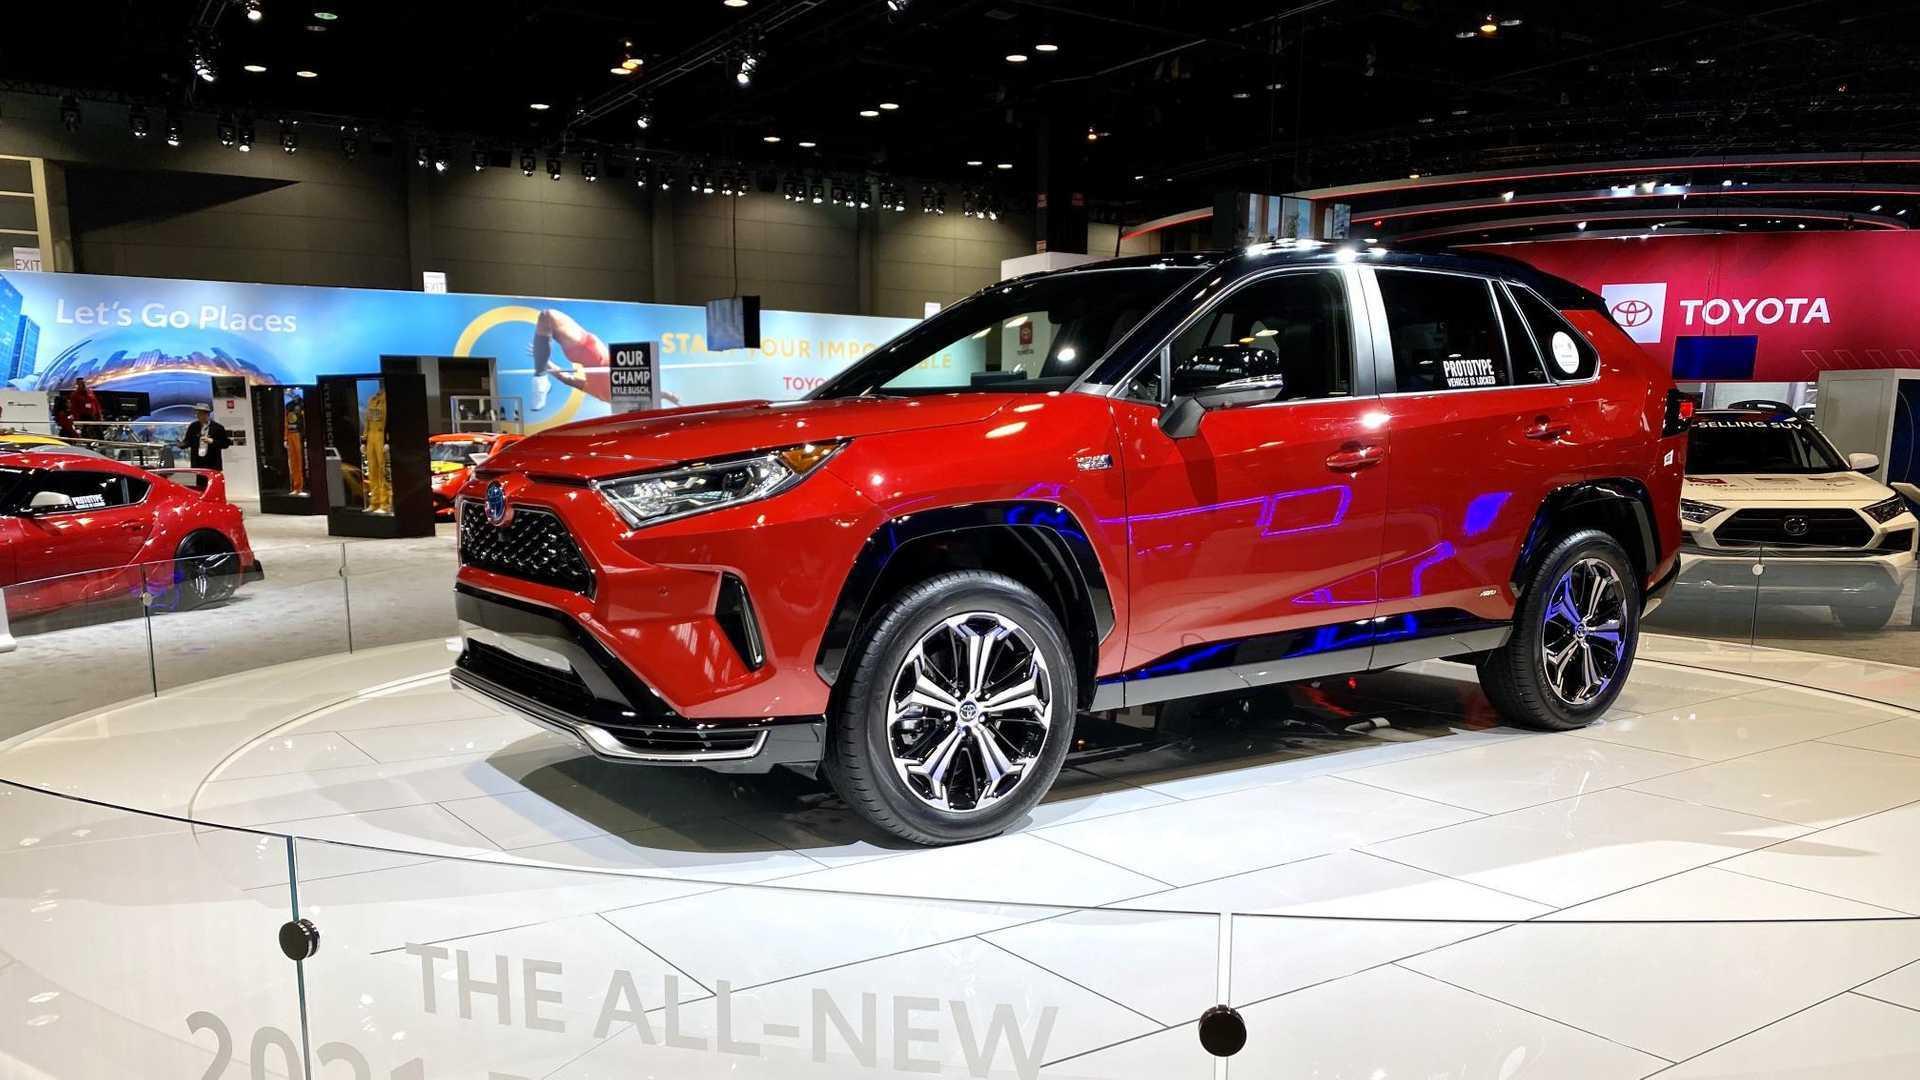 Toyota Rav4 Prime Hibrido Plug In De 306 Cv Tem Consumo De Ate 40 0 Km L